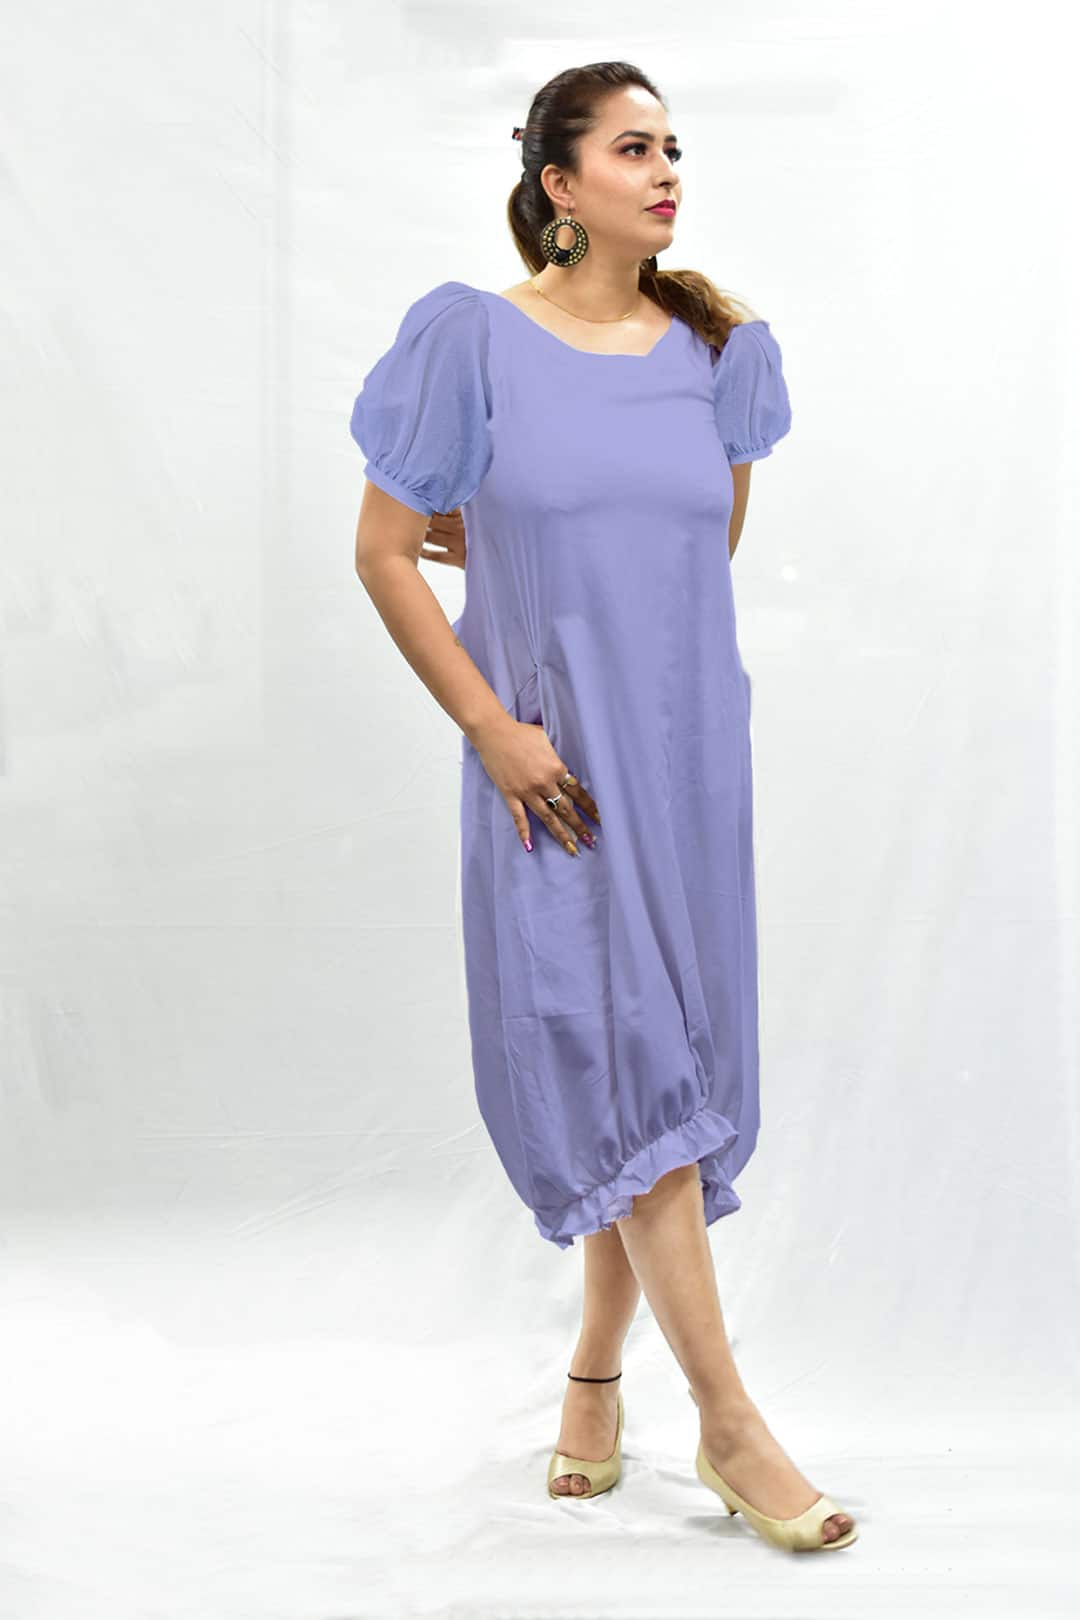 Cotton Ruffled Dress – Lavender